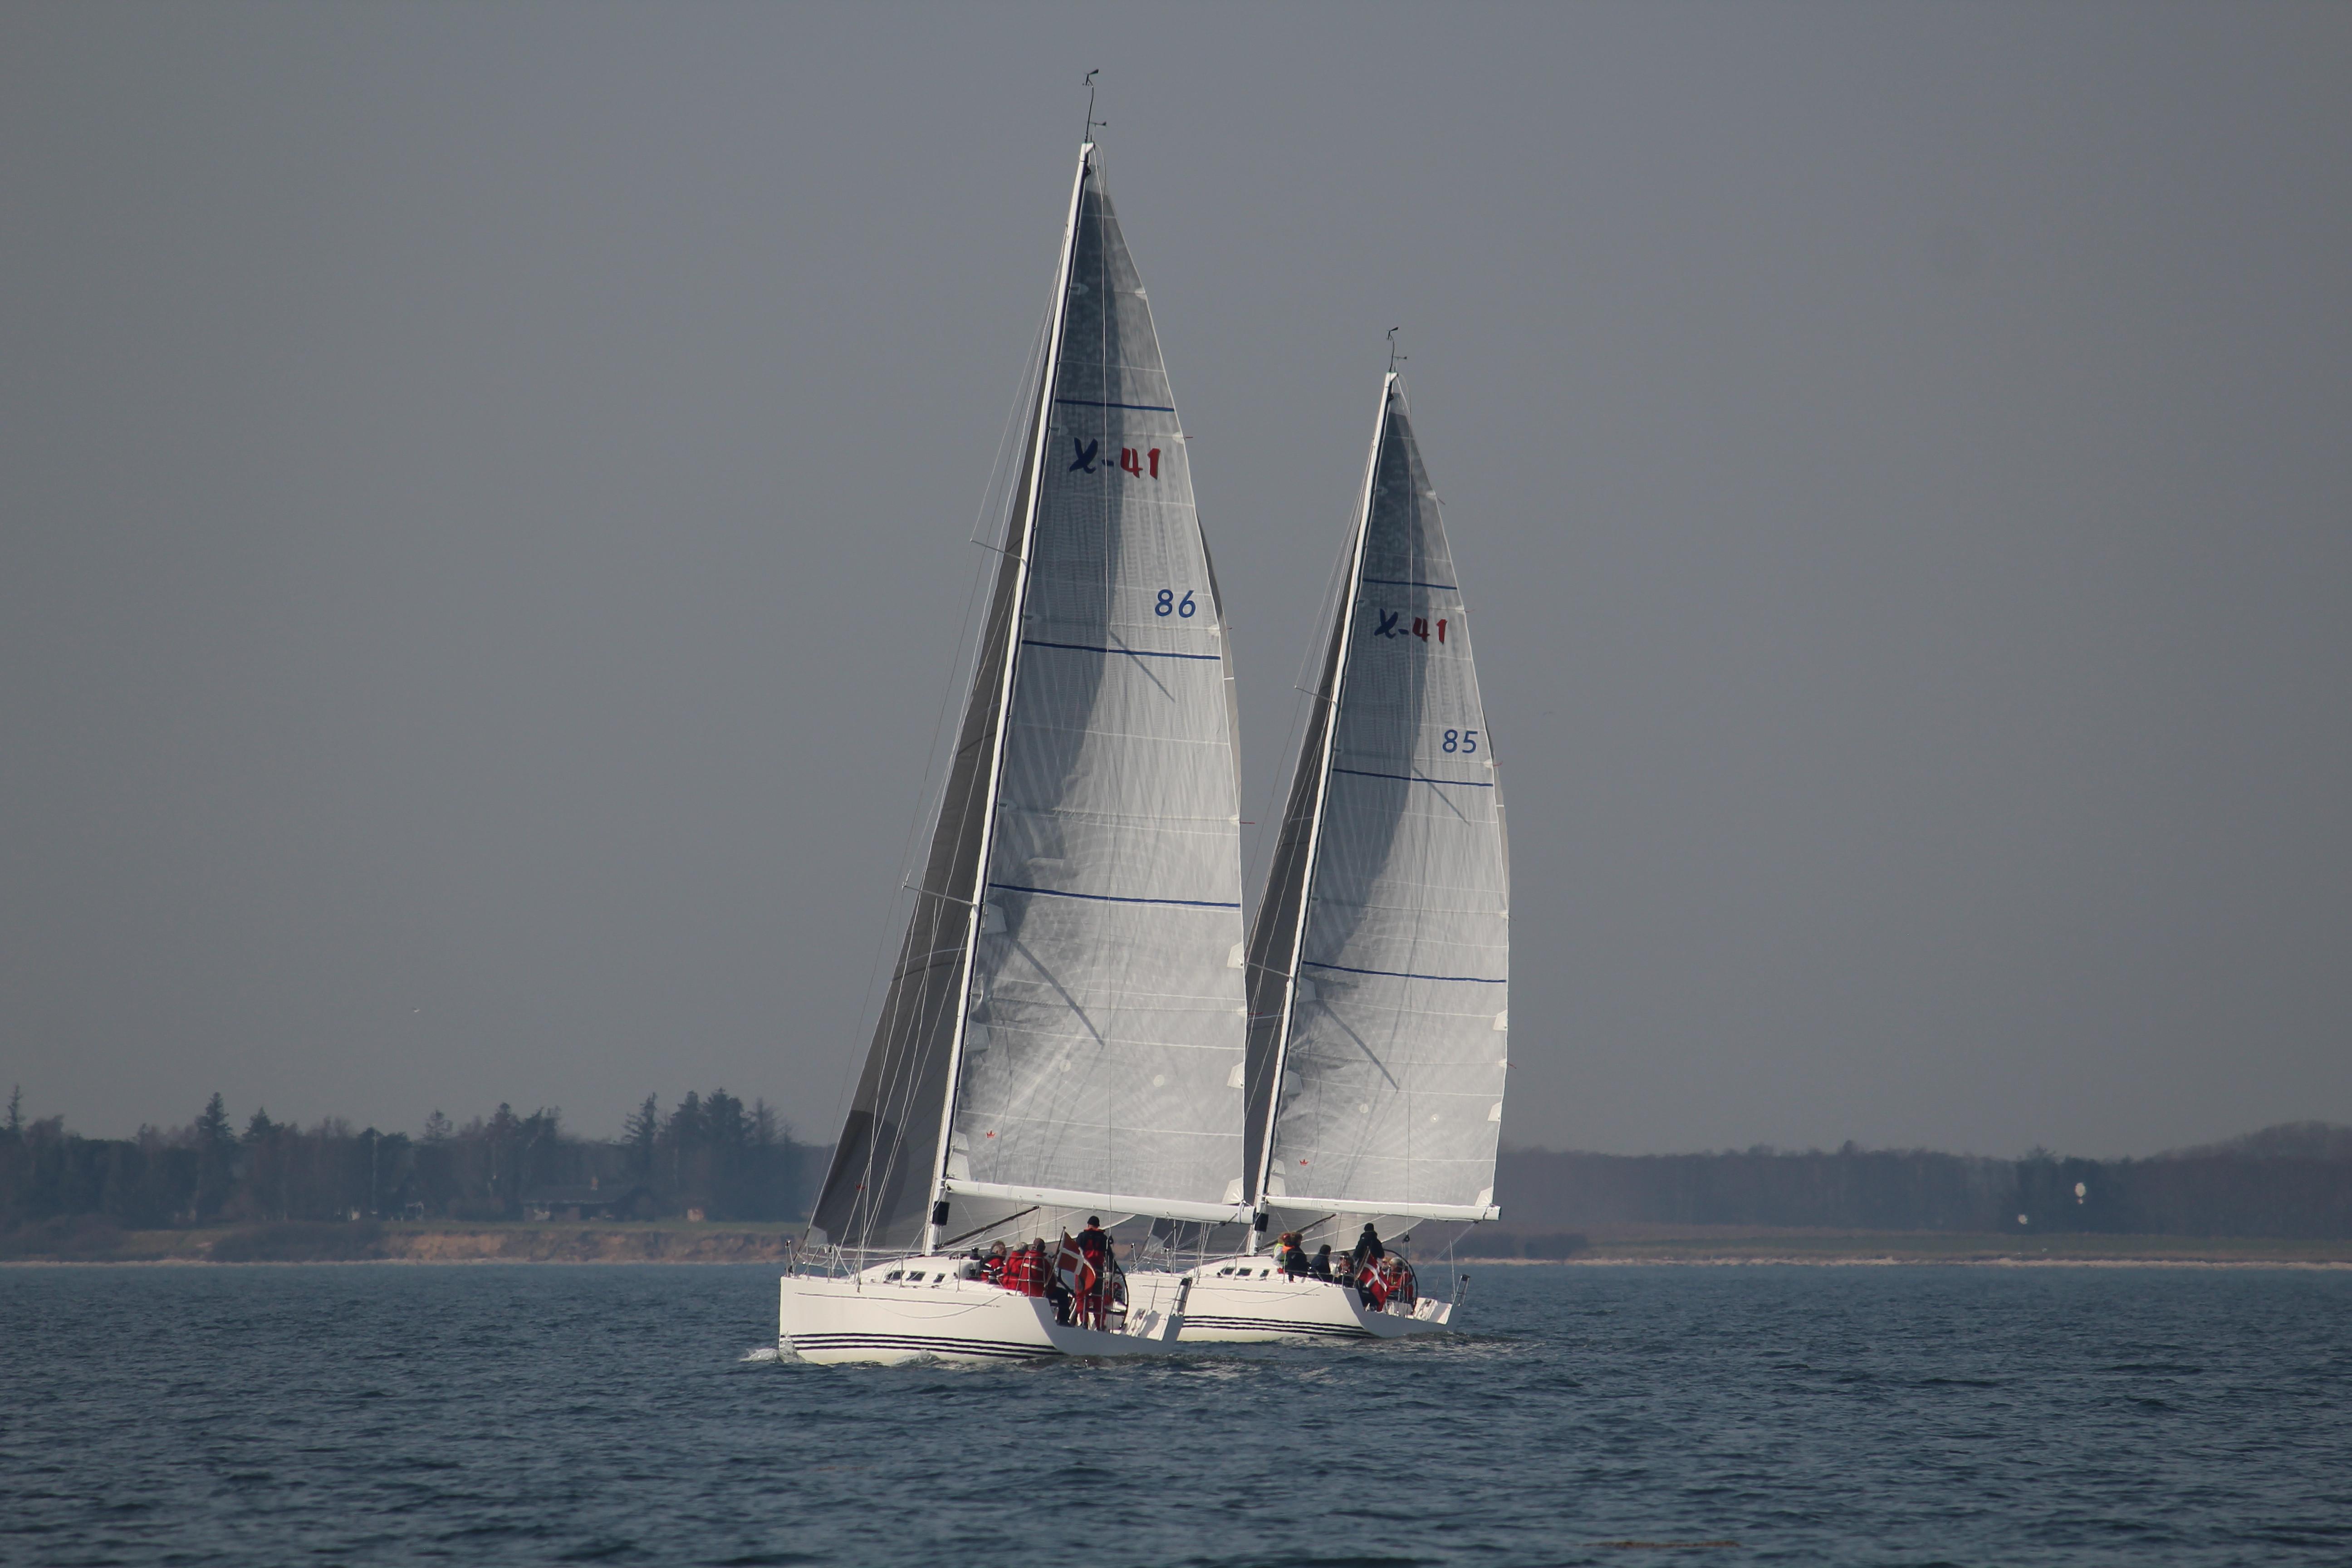 Season sailing